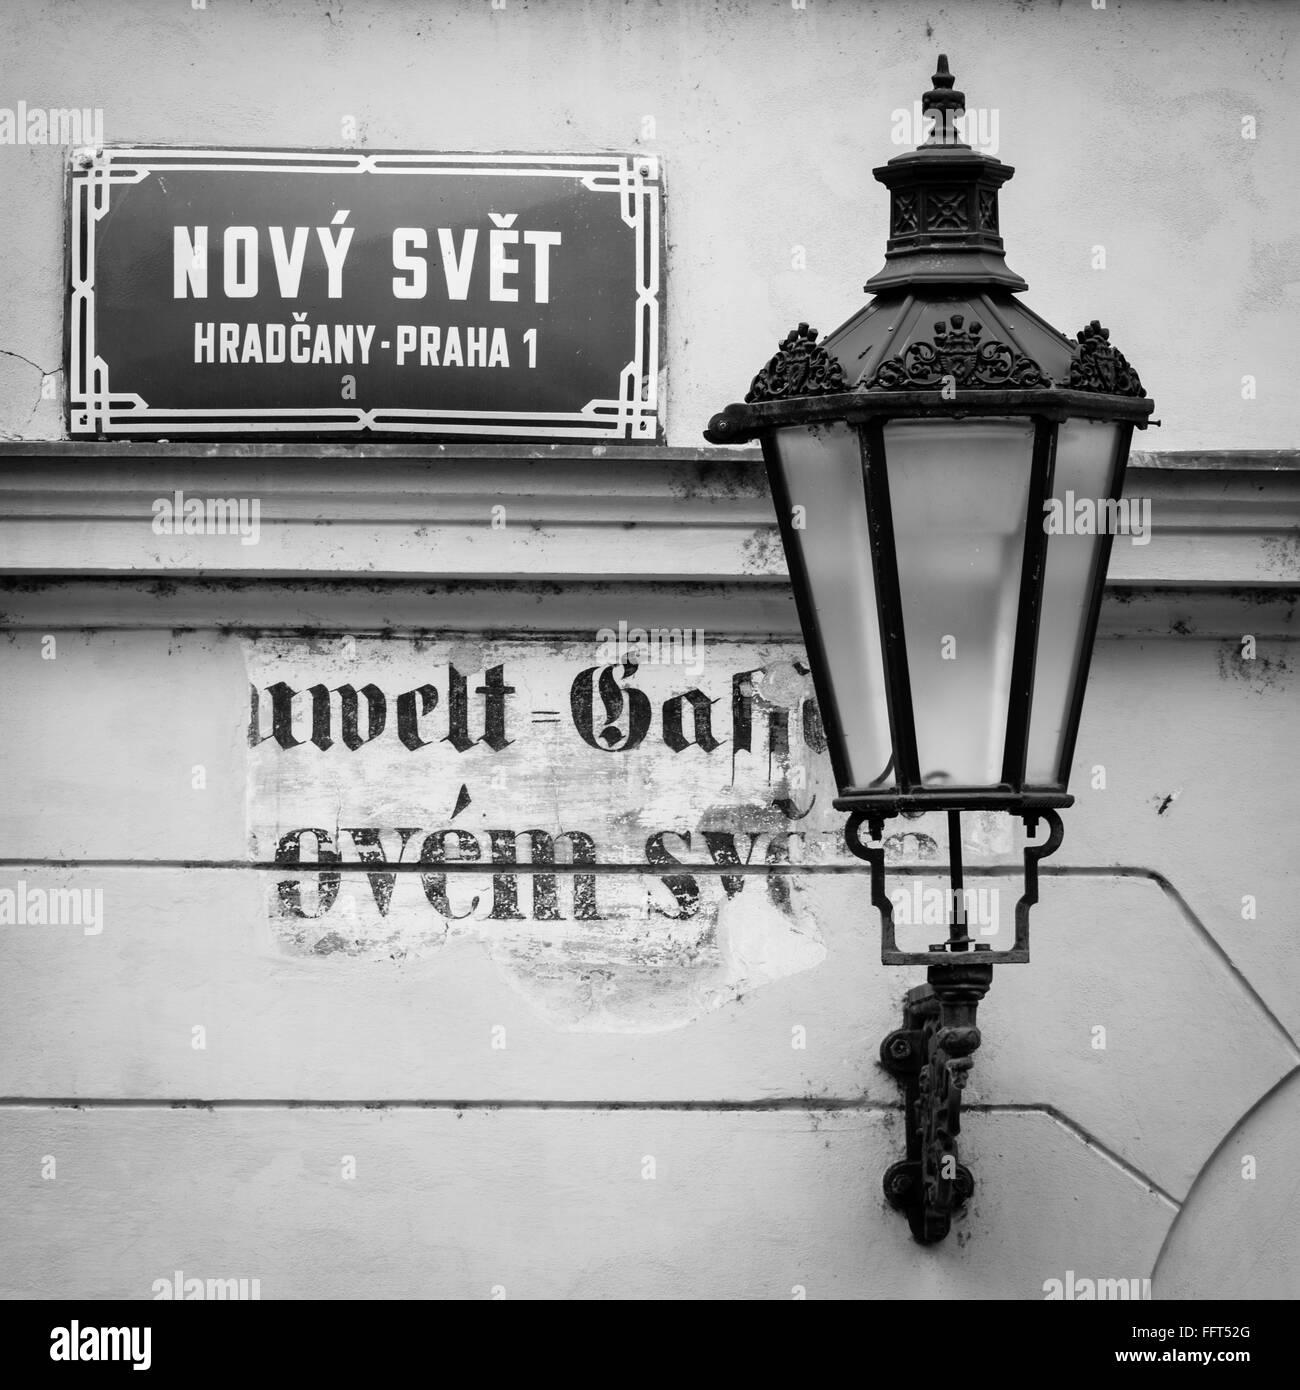 Vintage gas lamp - detail from old town Novy Svet, Prague Hradcany castle alley - Stock Image